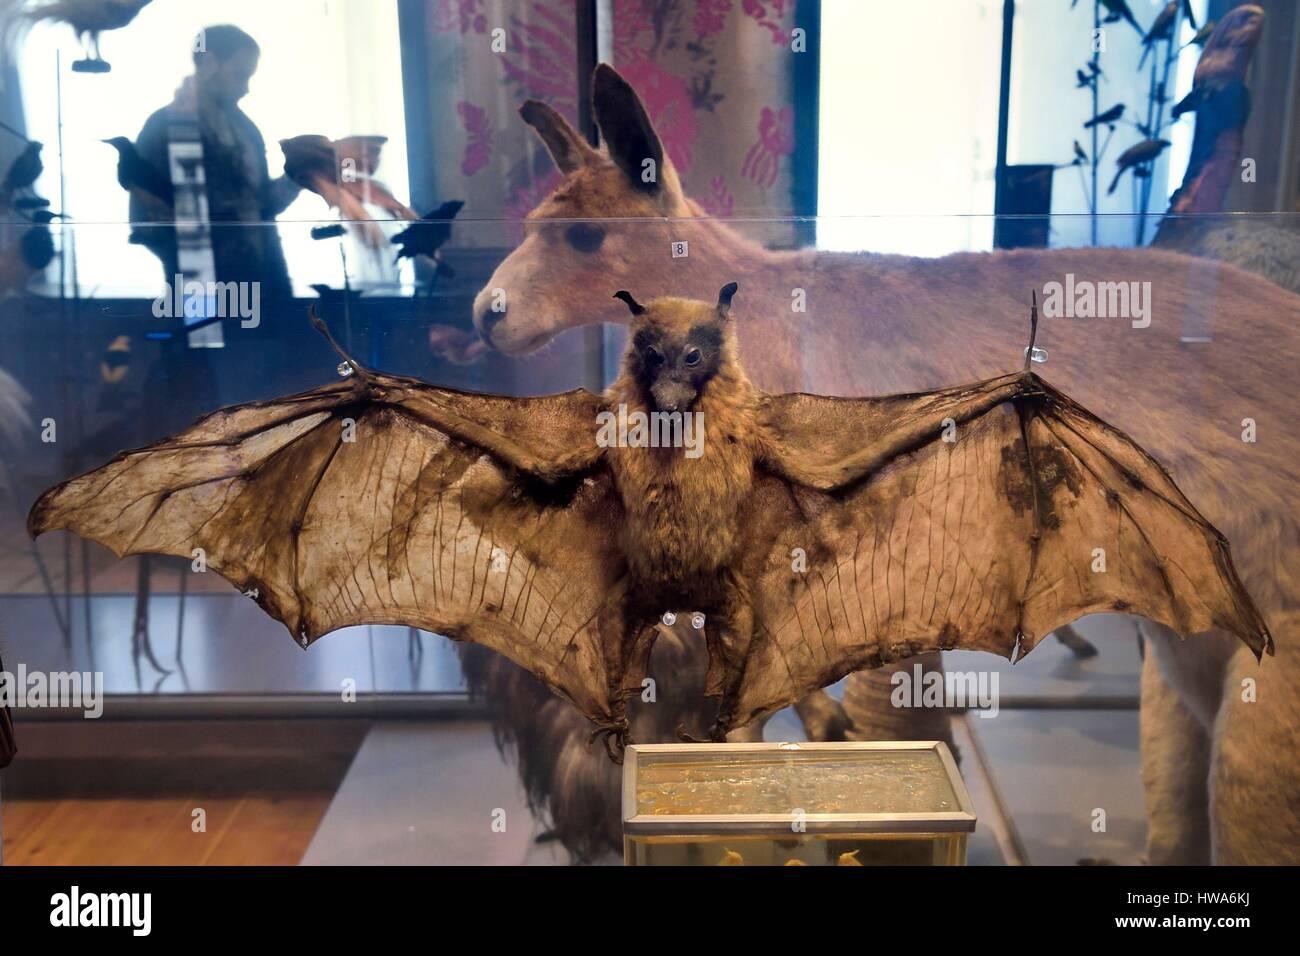 France, Charente-Maritime, La Rochelle, the Muséum d'histoire naturelle (natural history museum or museum - Stock Image